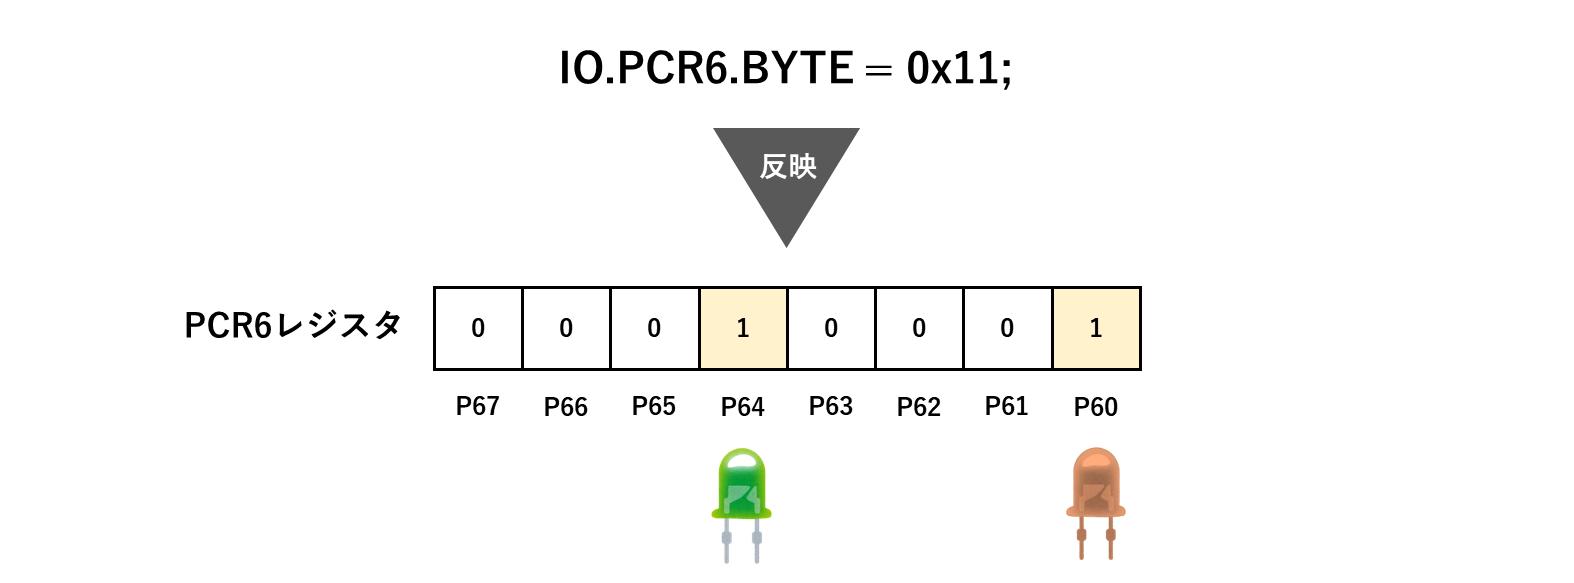 PCR6の設定イメージ